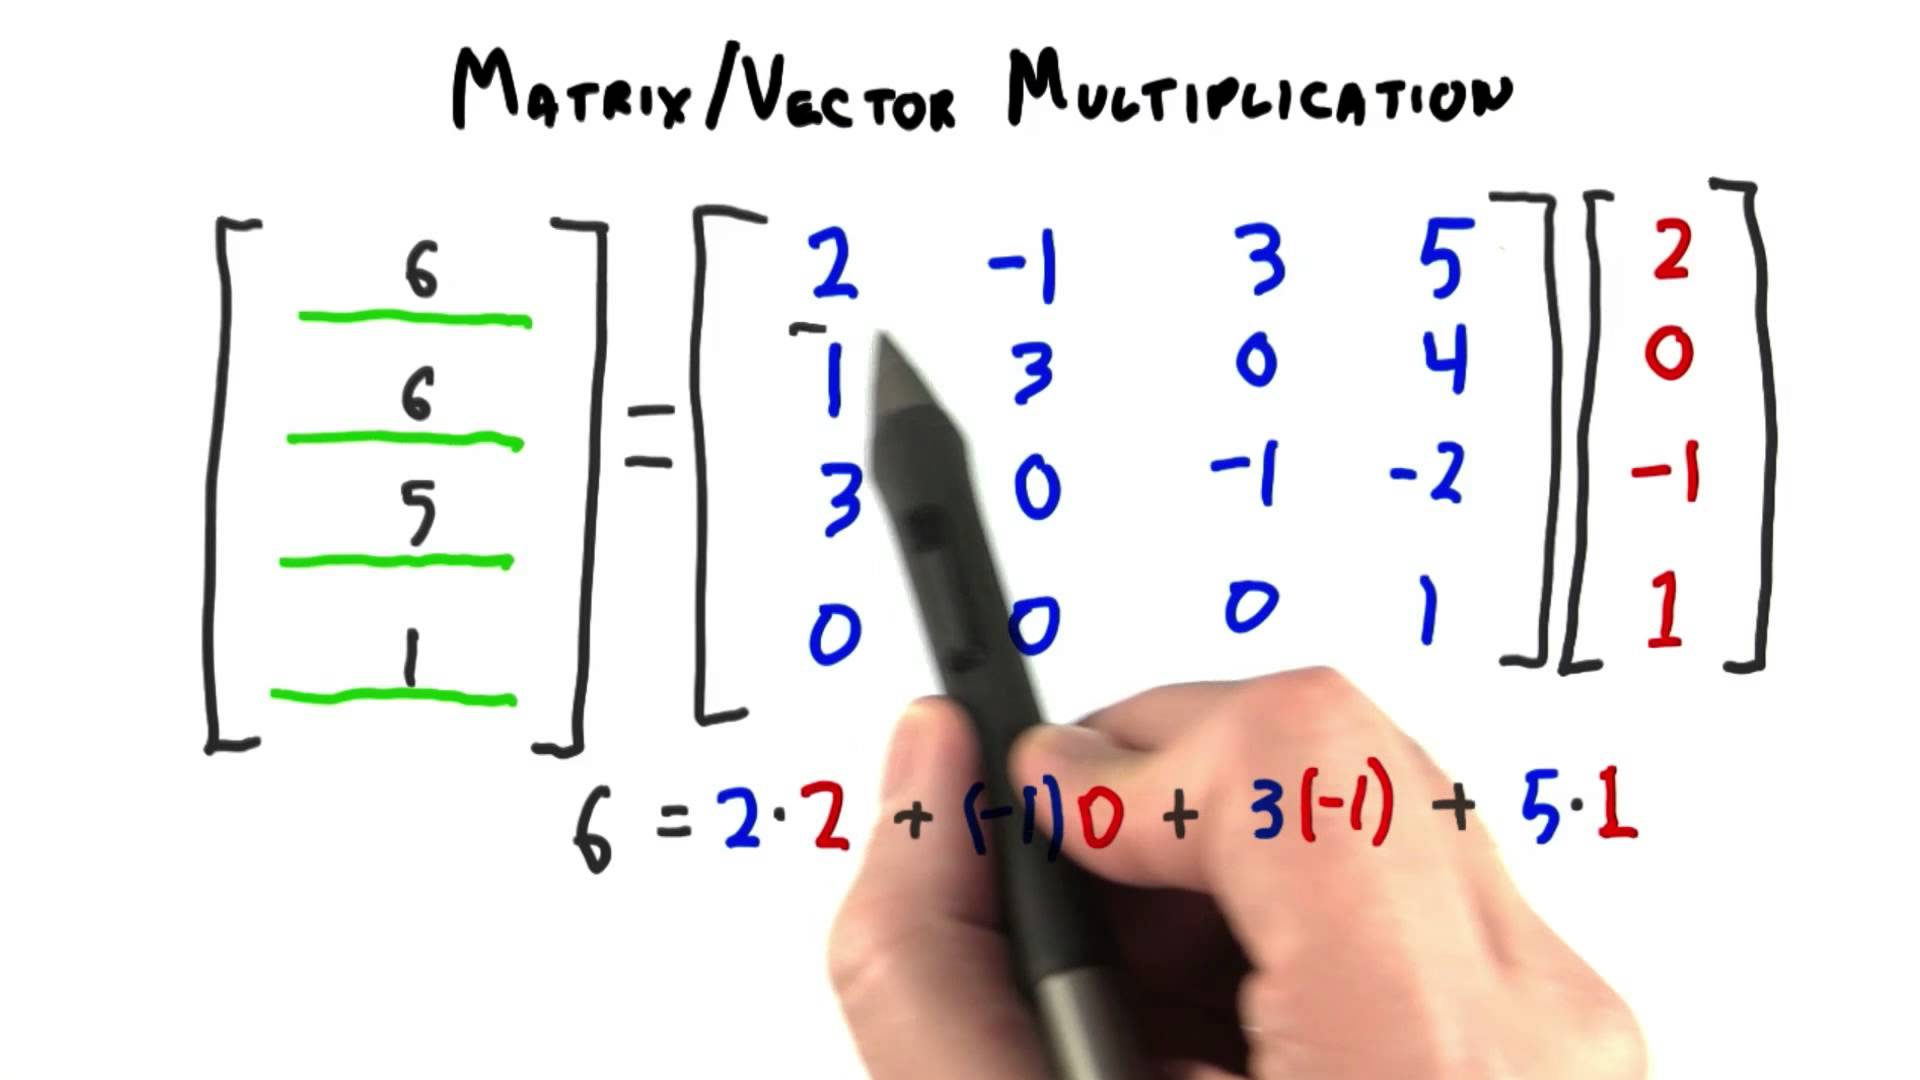 1920x1080 Matrix Vector Multiplication